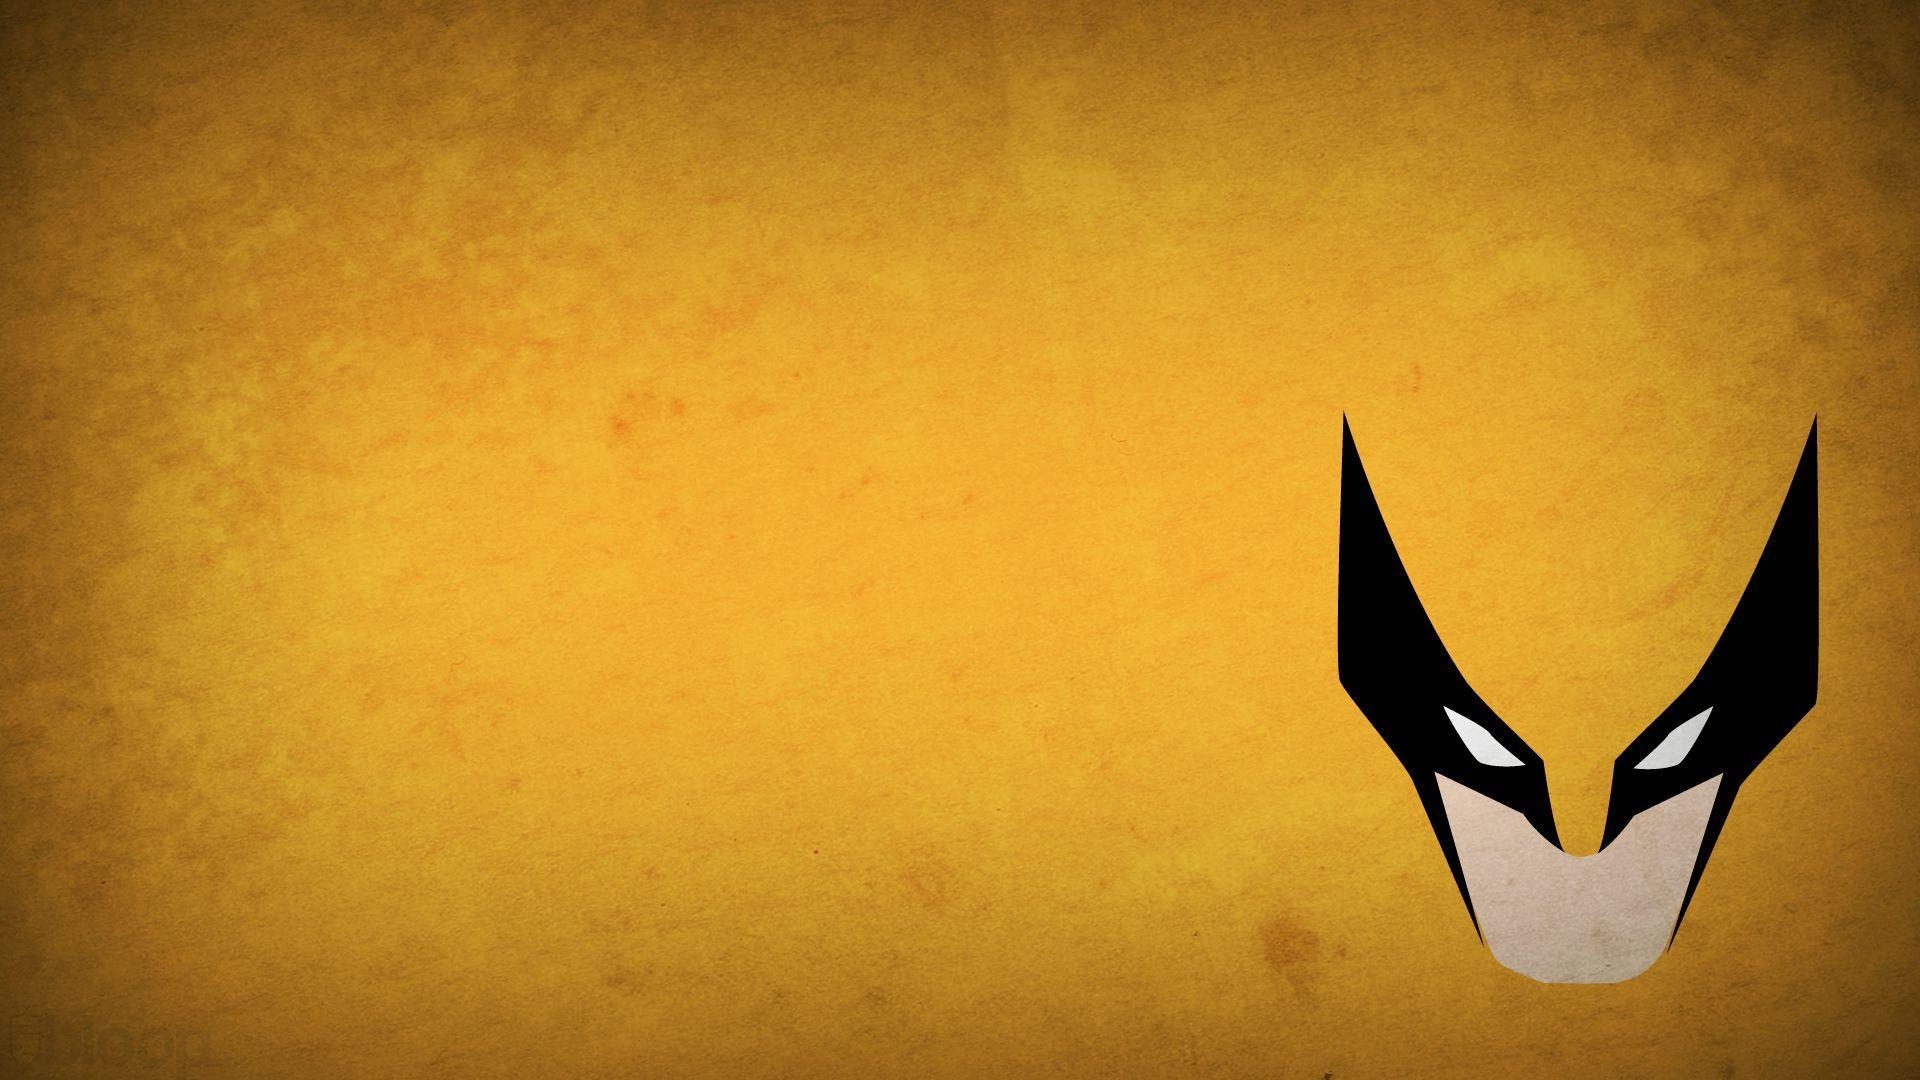 Best Wallpaper High Resolution Wolverine - 25ec910b41c5e325323f95ab15963d8f  Best Photo Reference_434617.jpg